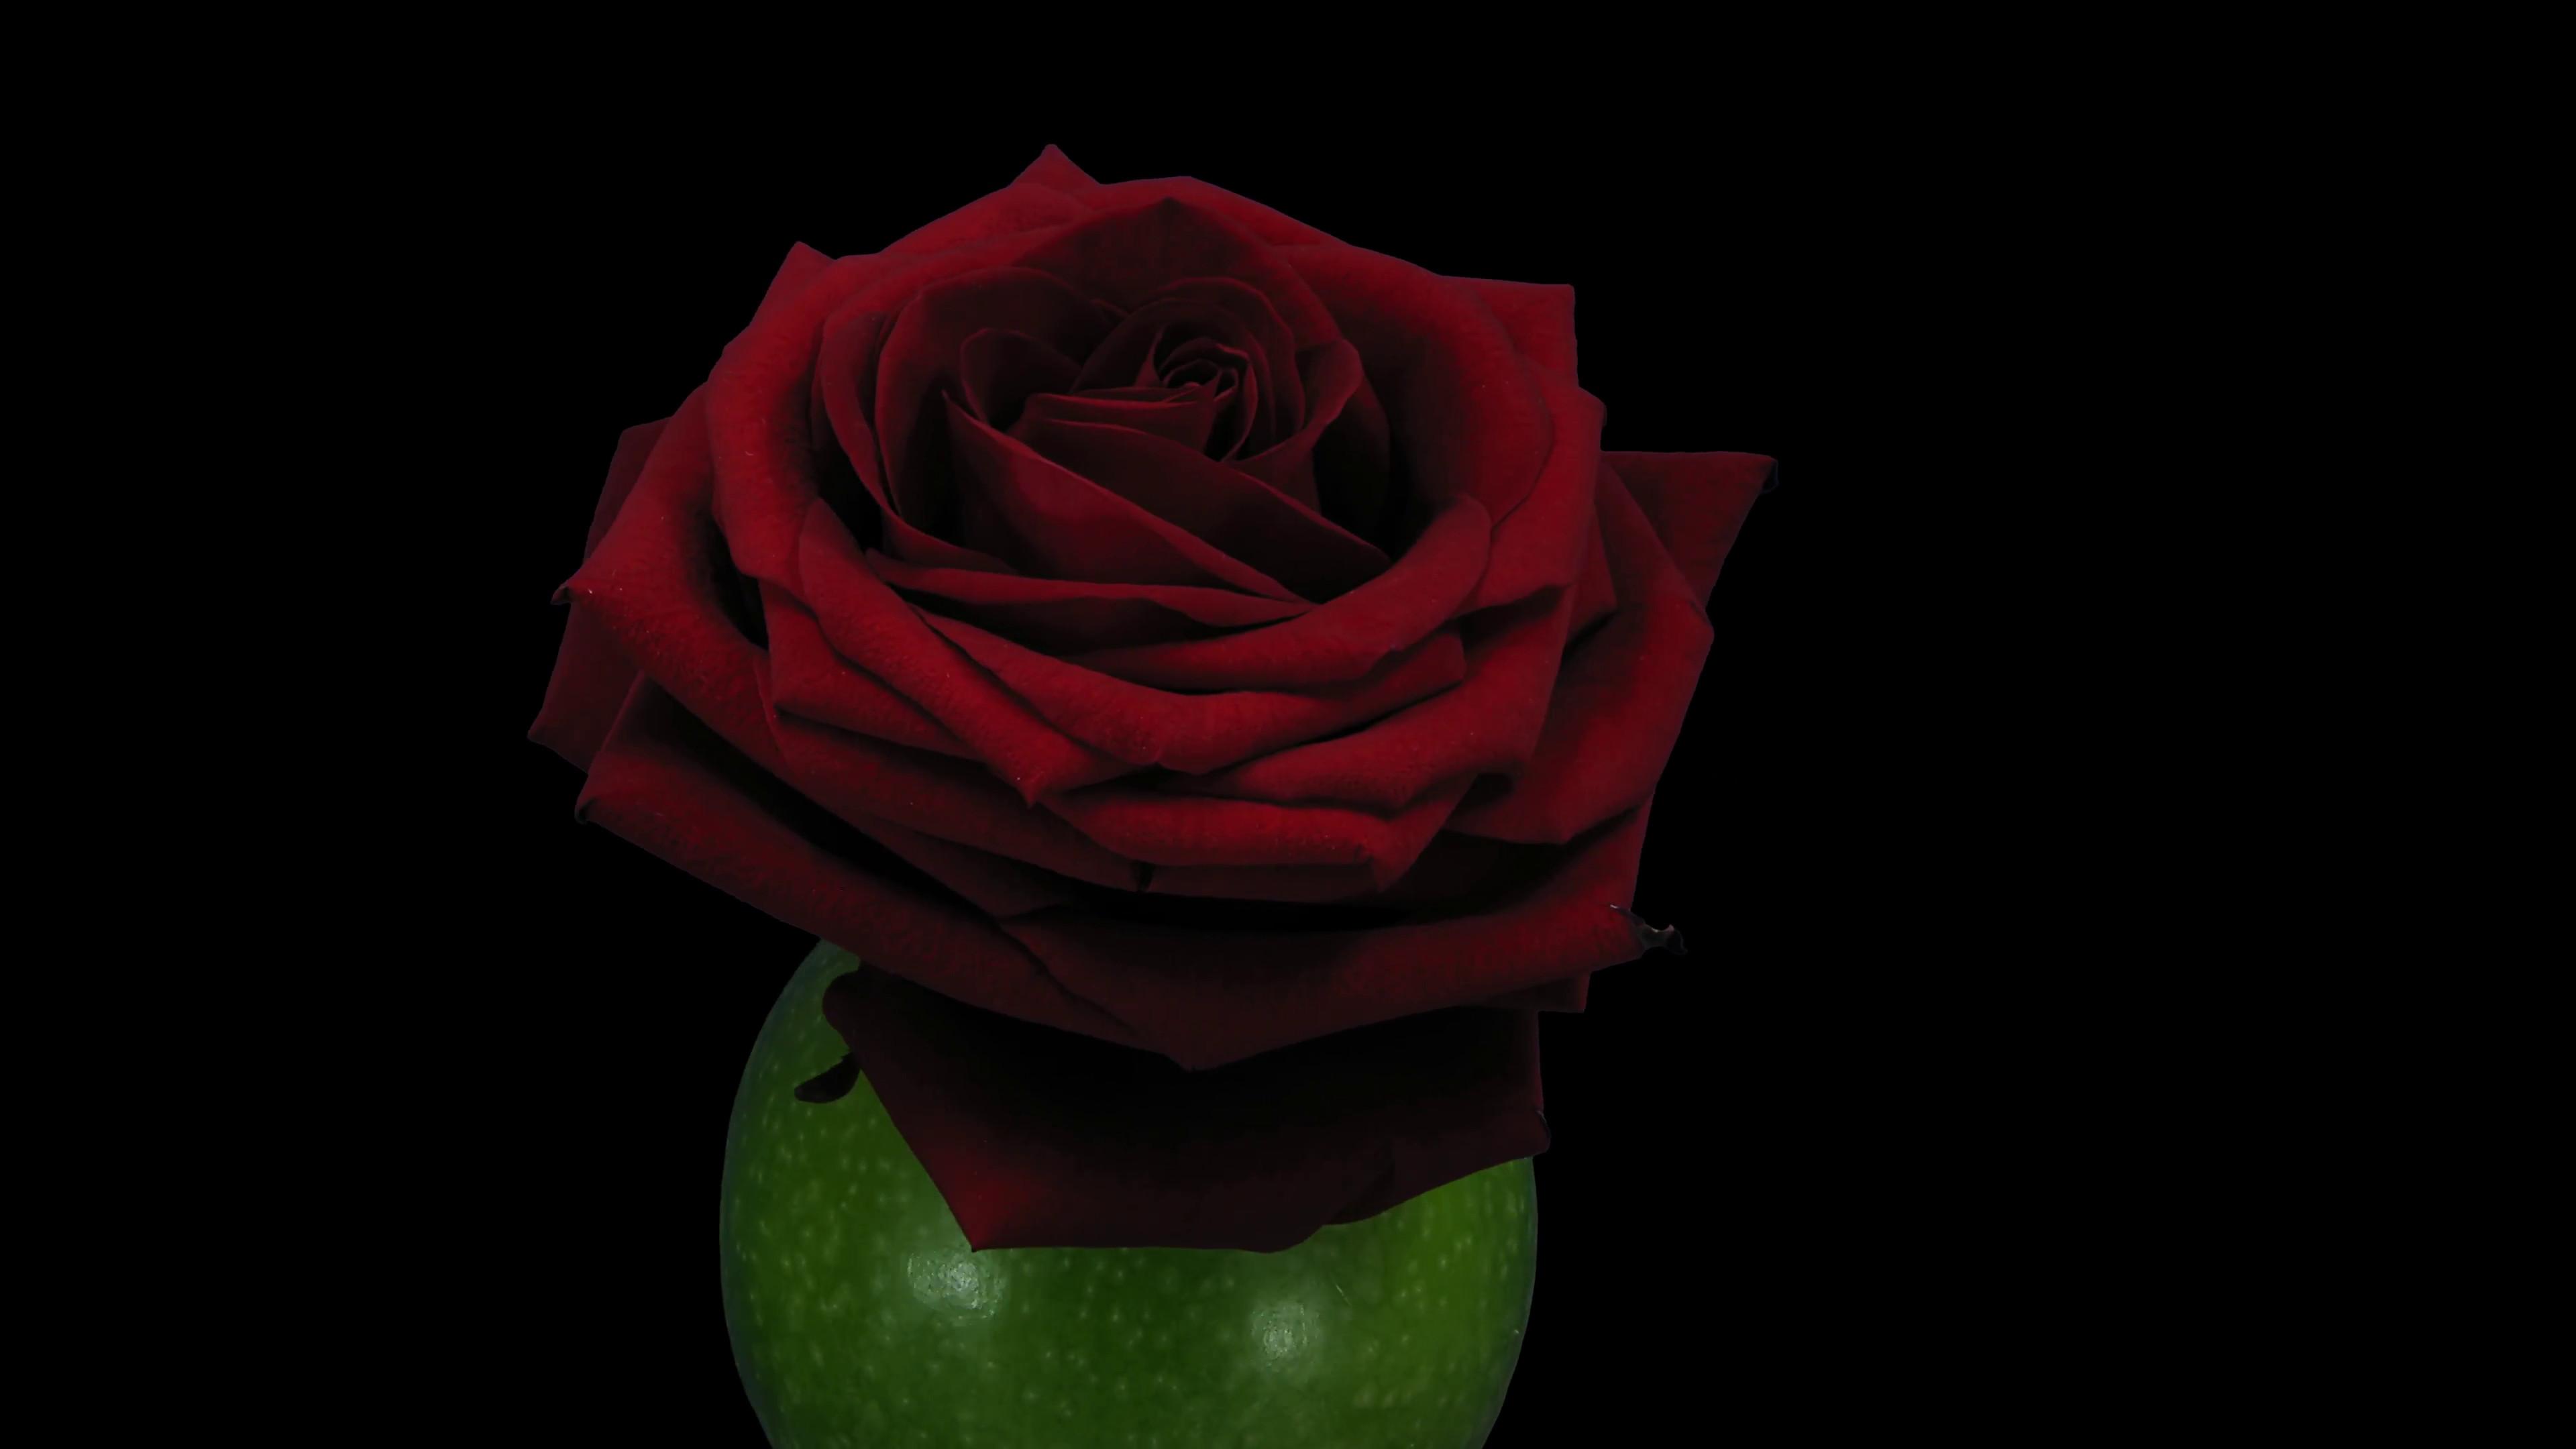 Rose Petals Falling Wallpaper Red Rose On Black Background 183 ① Wallpapertag